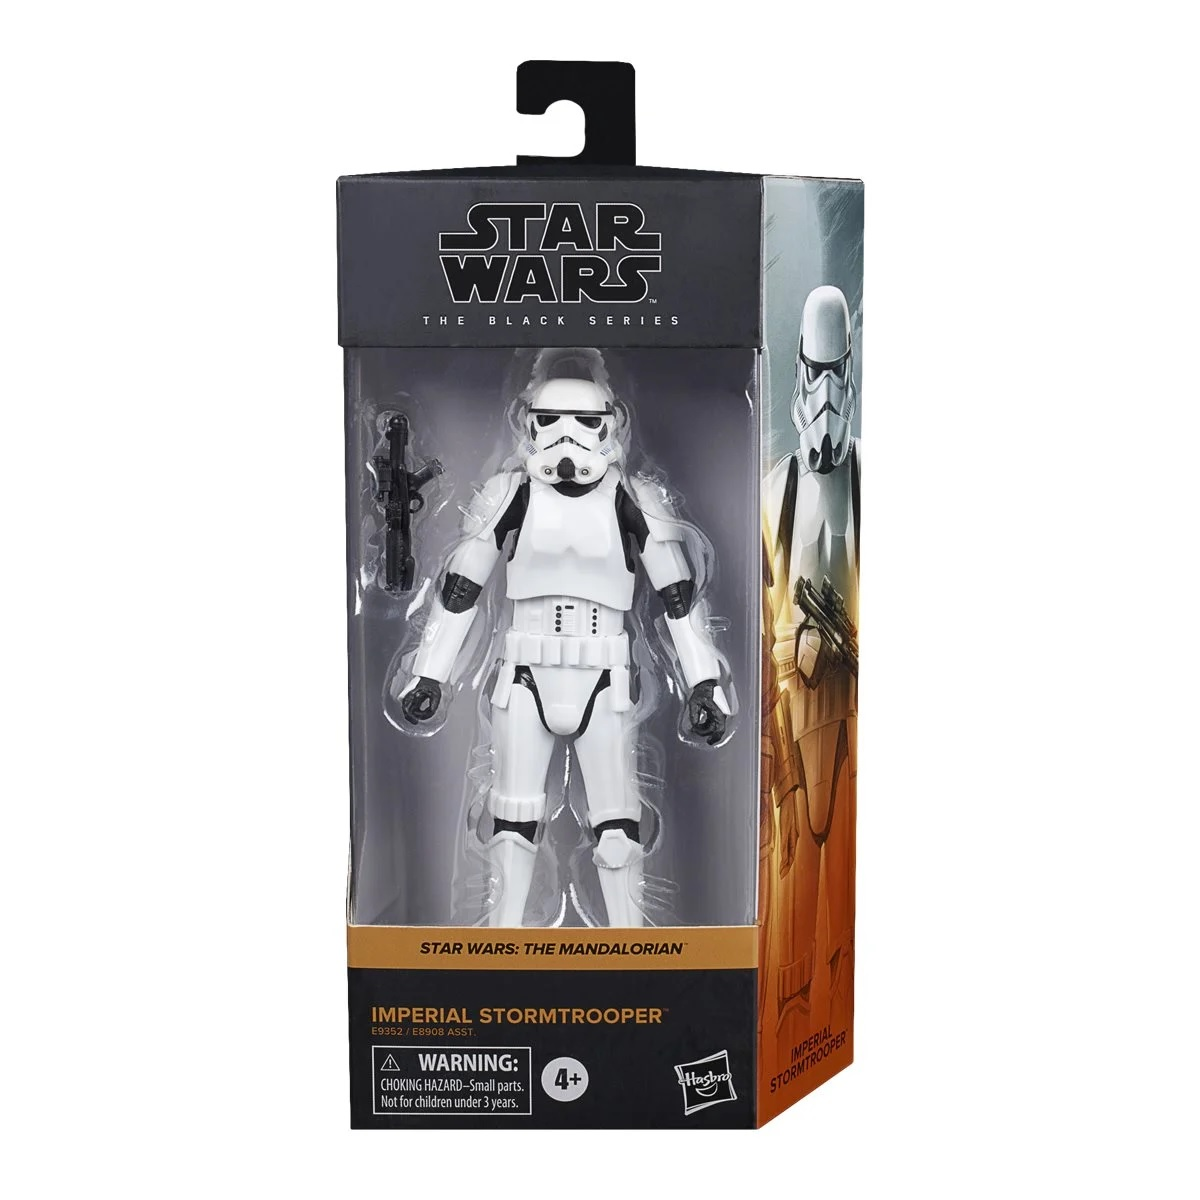 Imperial Stormtrooper 2